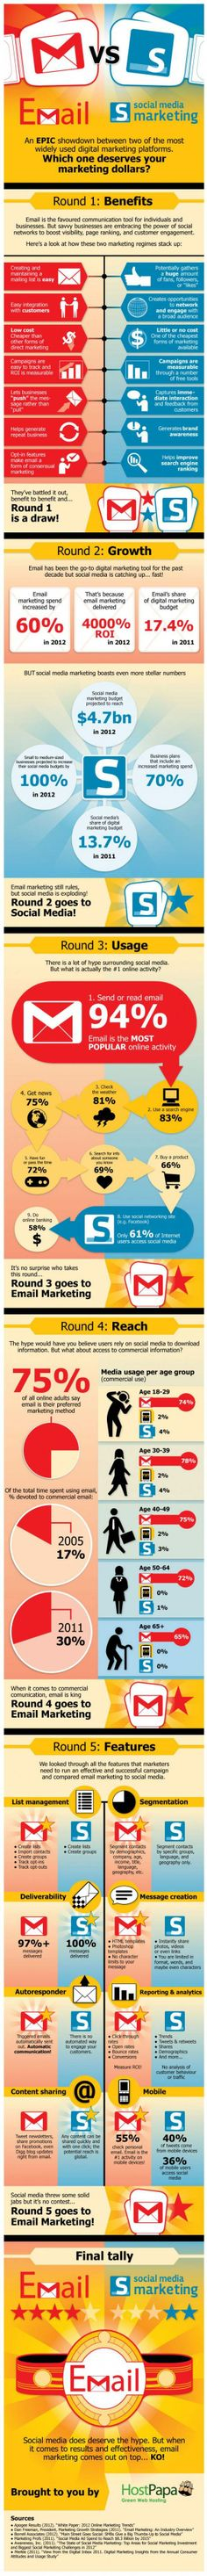 Email Vs Social Media Marketing